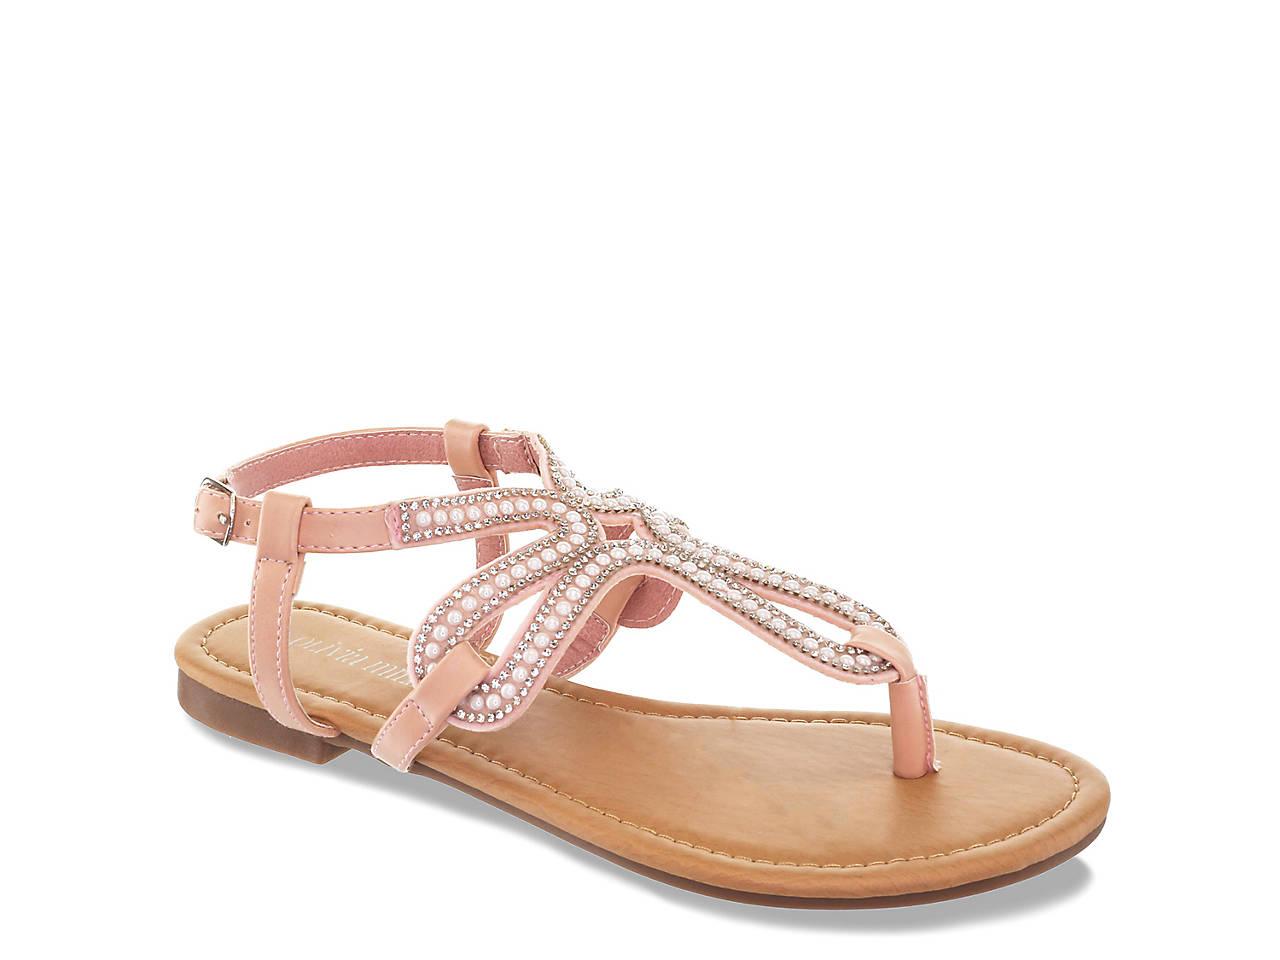 d14e3e4ea1a4 Olivia Miller Cute And Crafty Sandal Women s Shoes